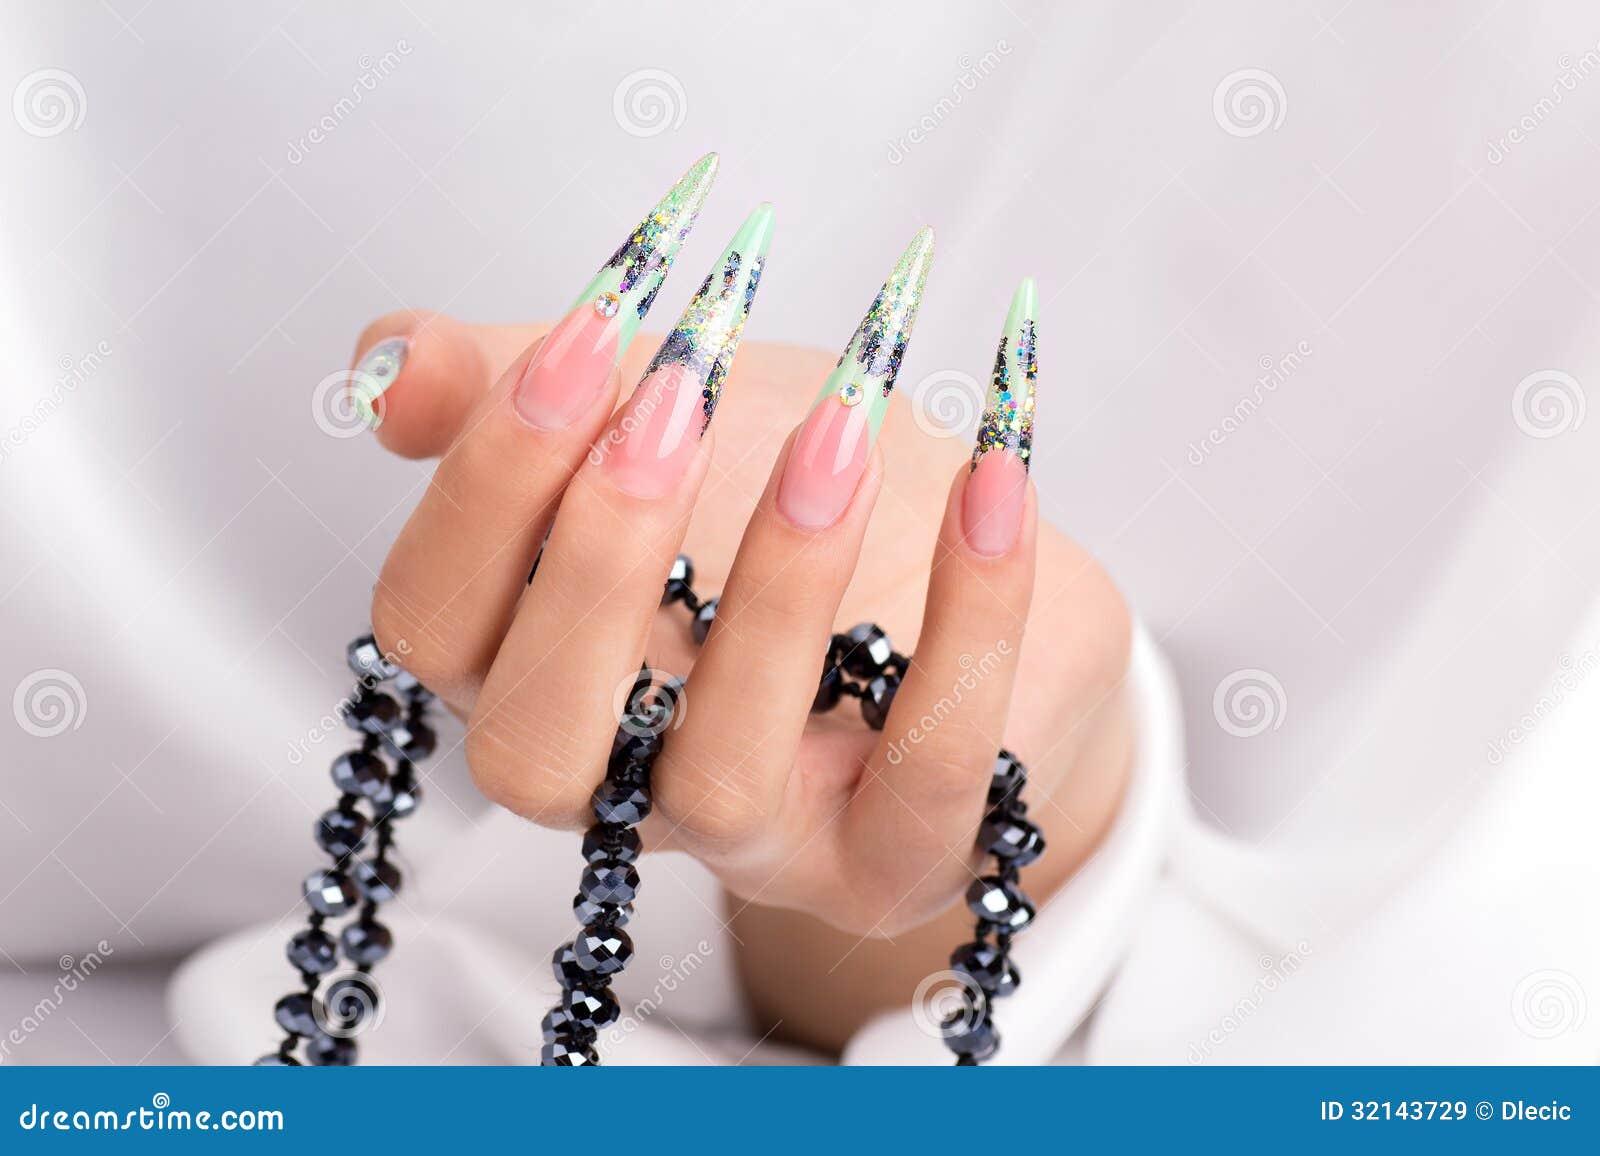 Beautiful Polished Nails Stock Image Image Of Event 32143729